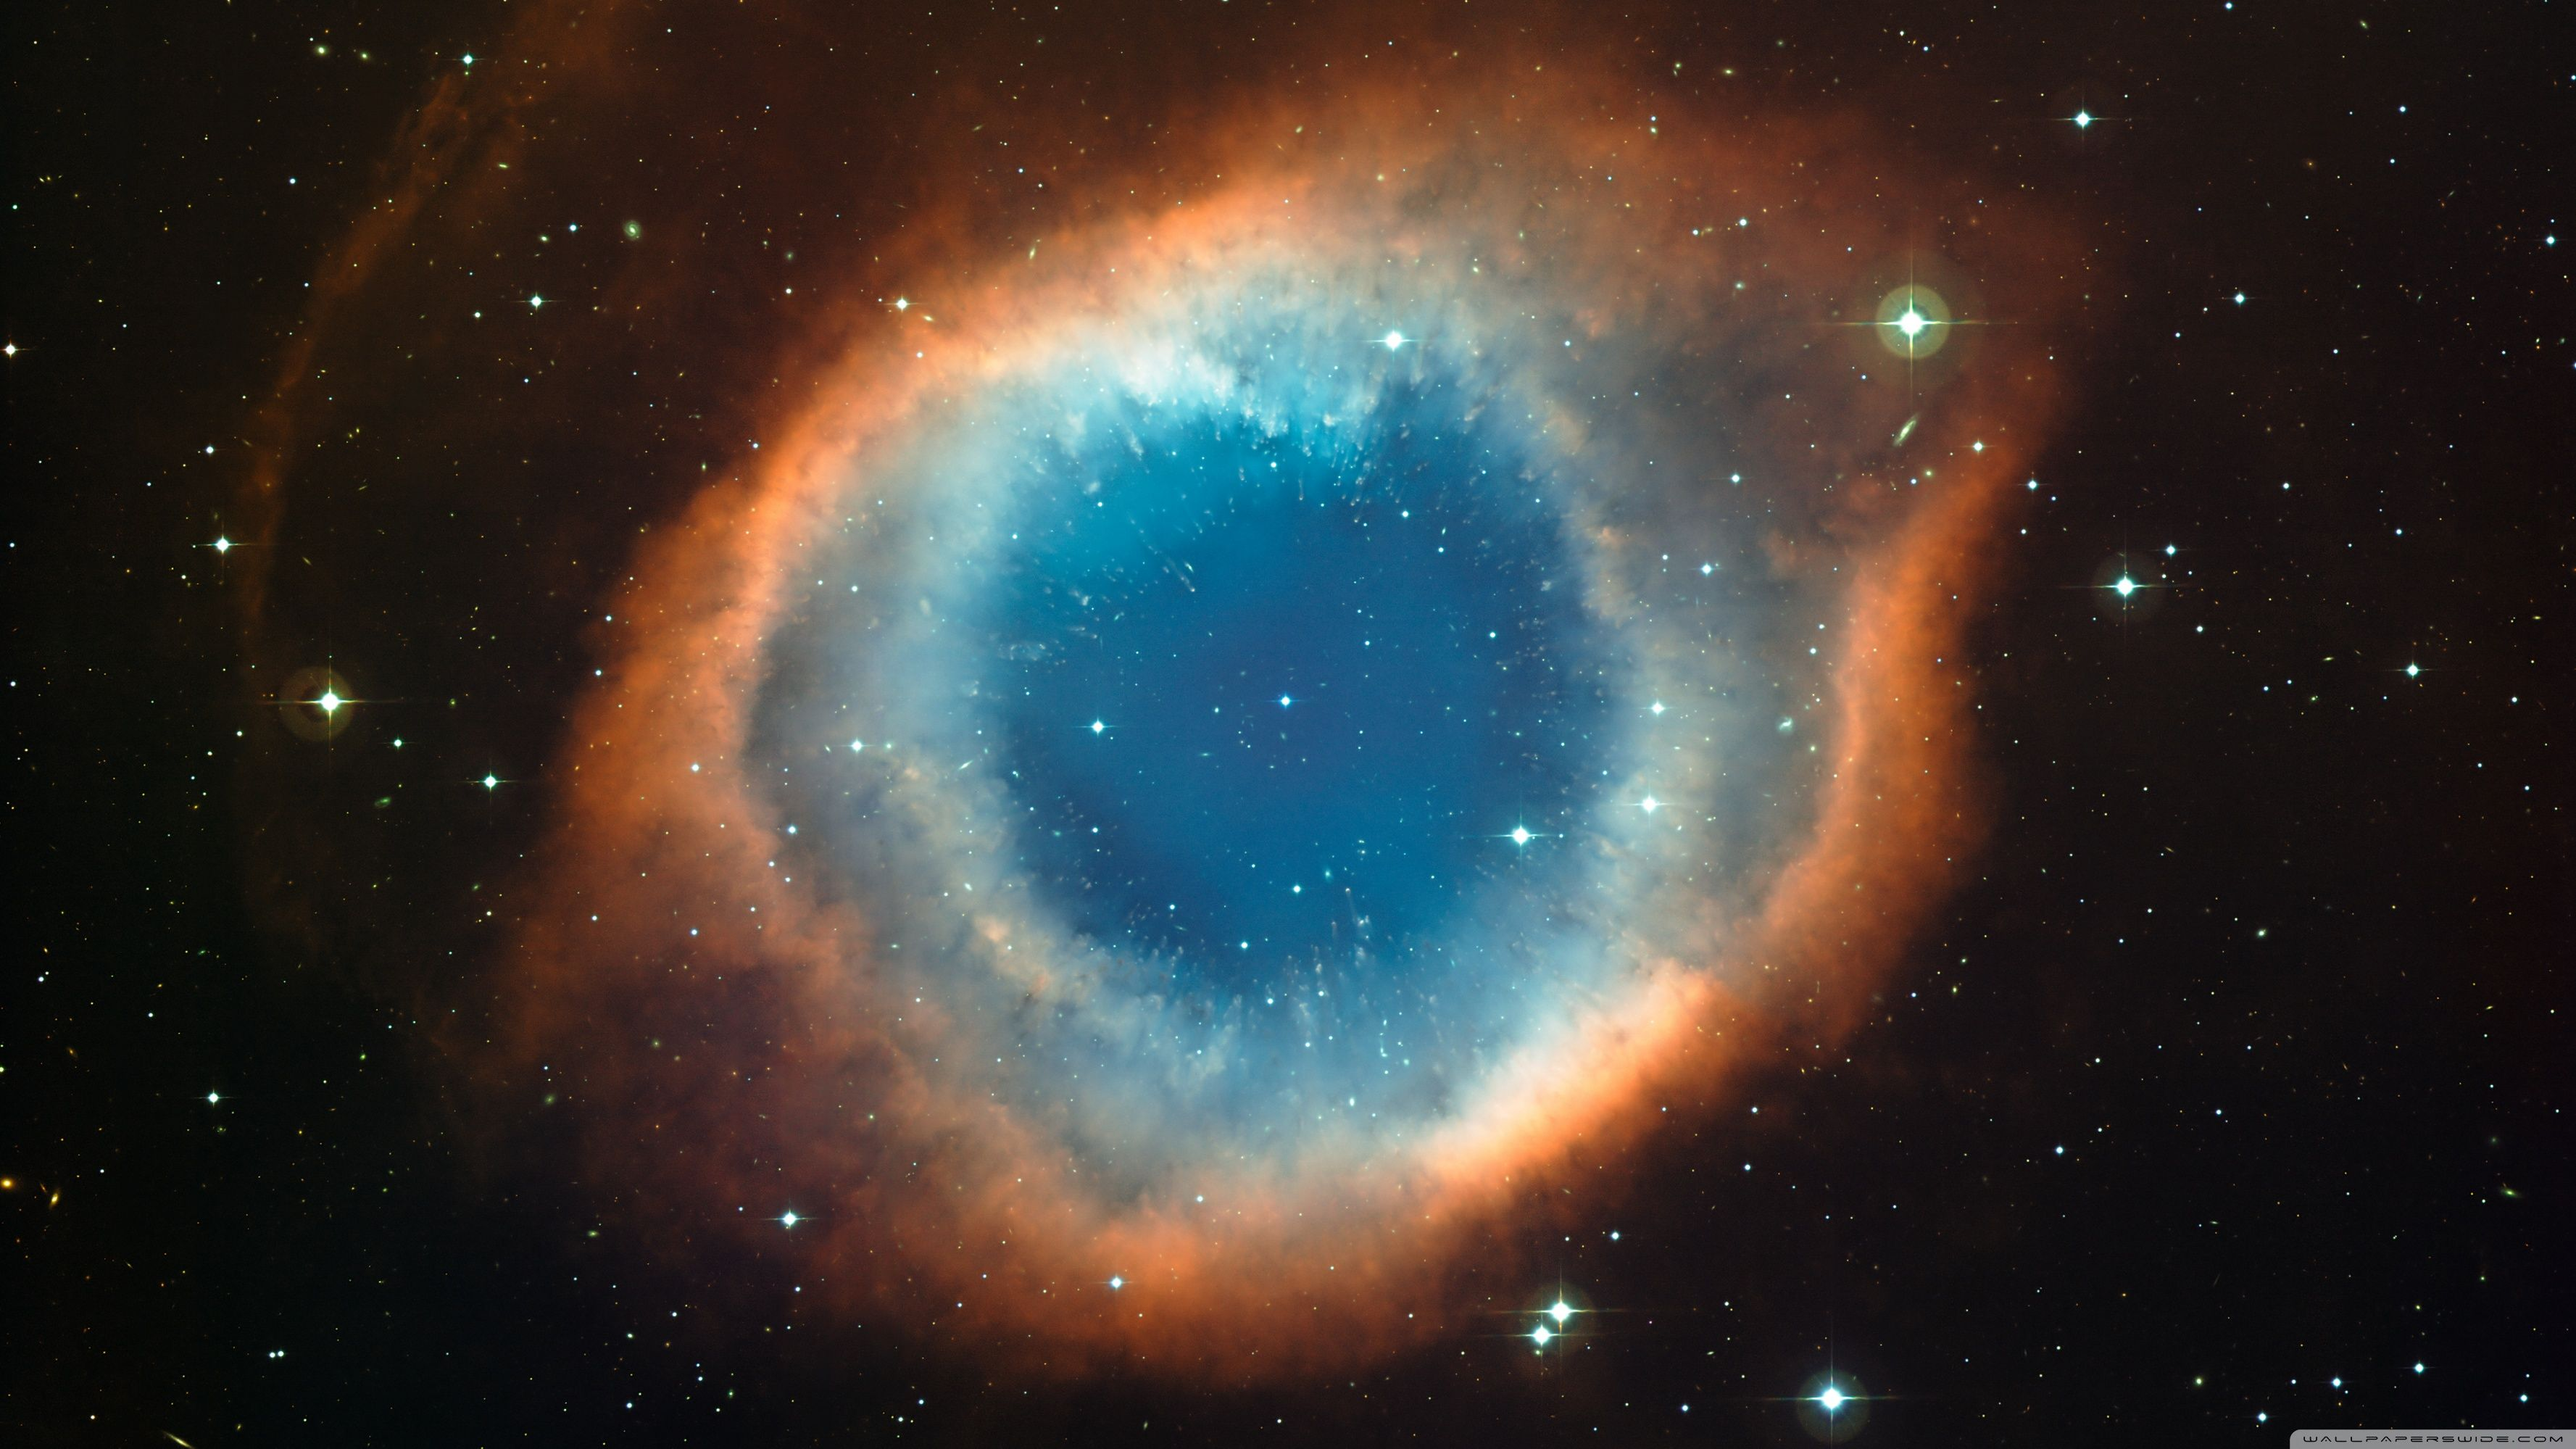 God S Eye Nebula Wallpapers Top Free God S Eye Nebula Backgrounds Wallpaperaccess